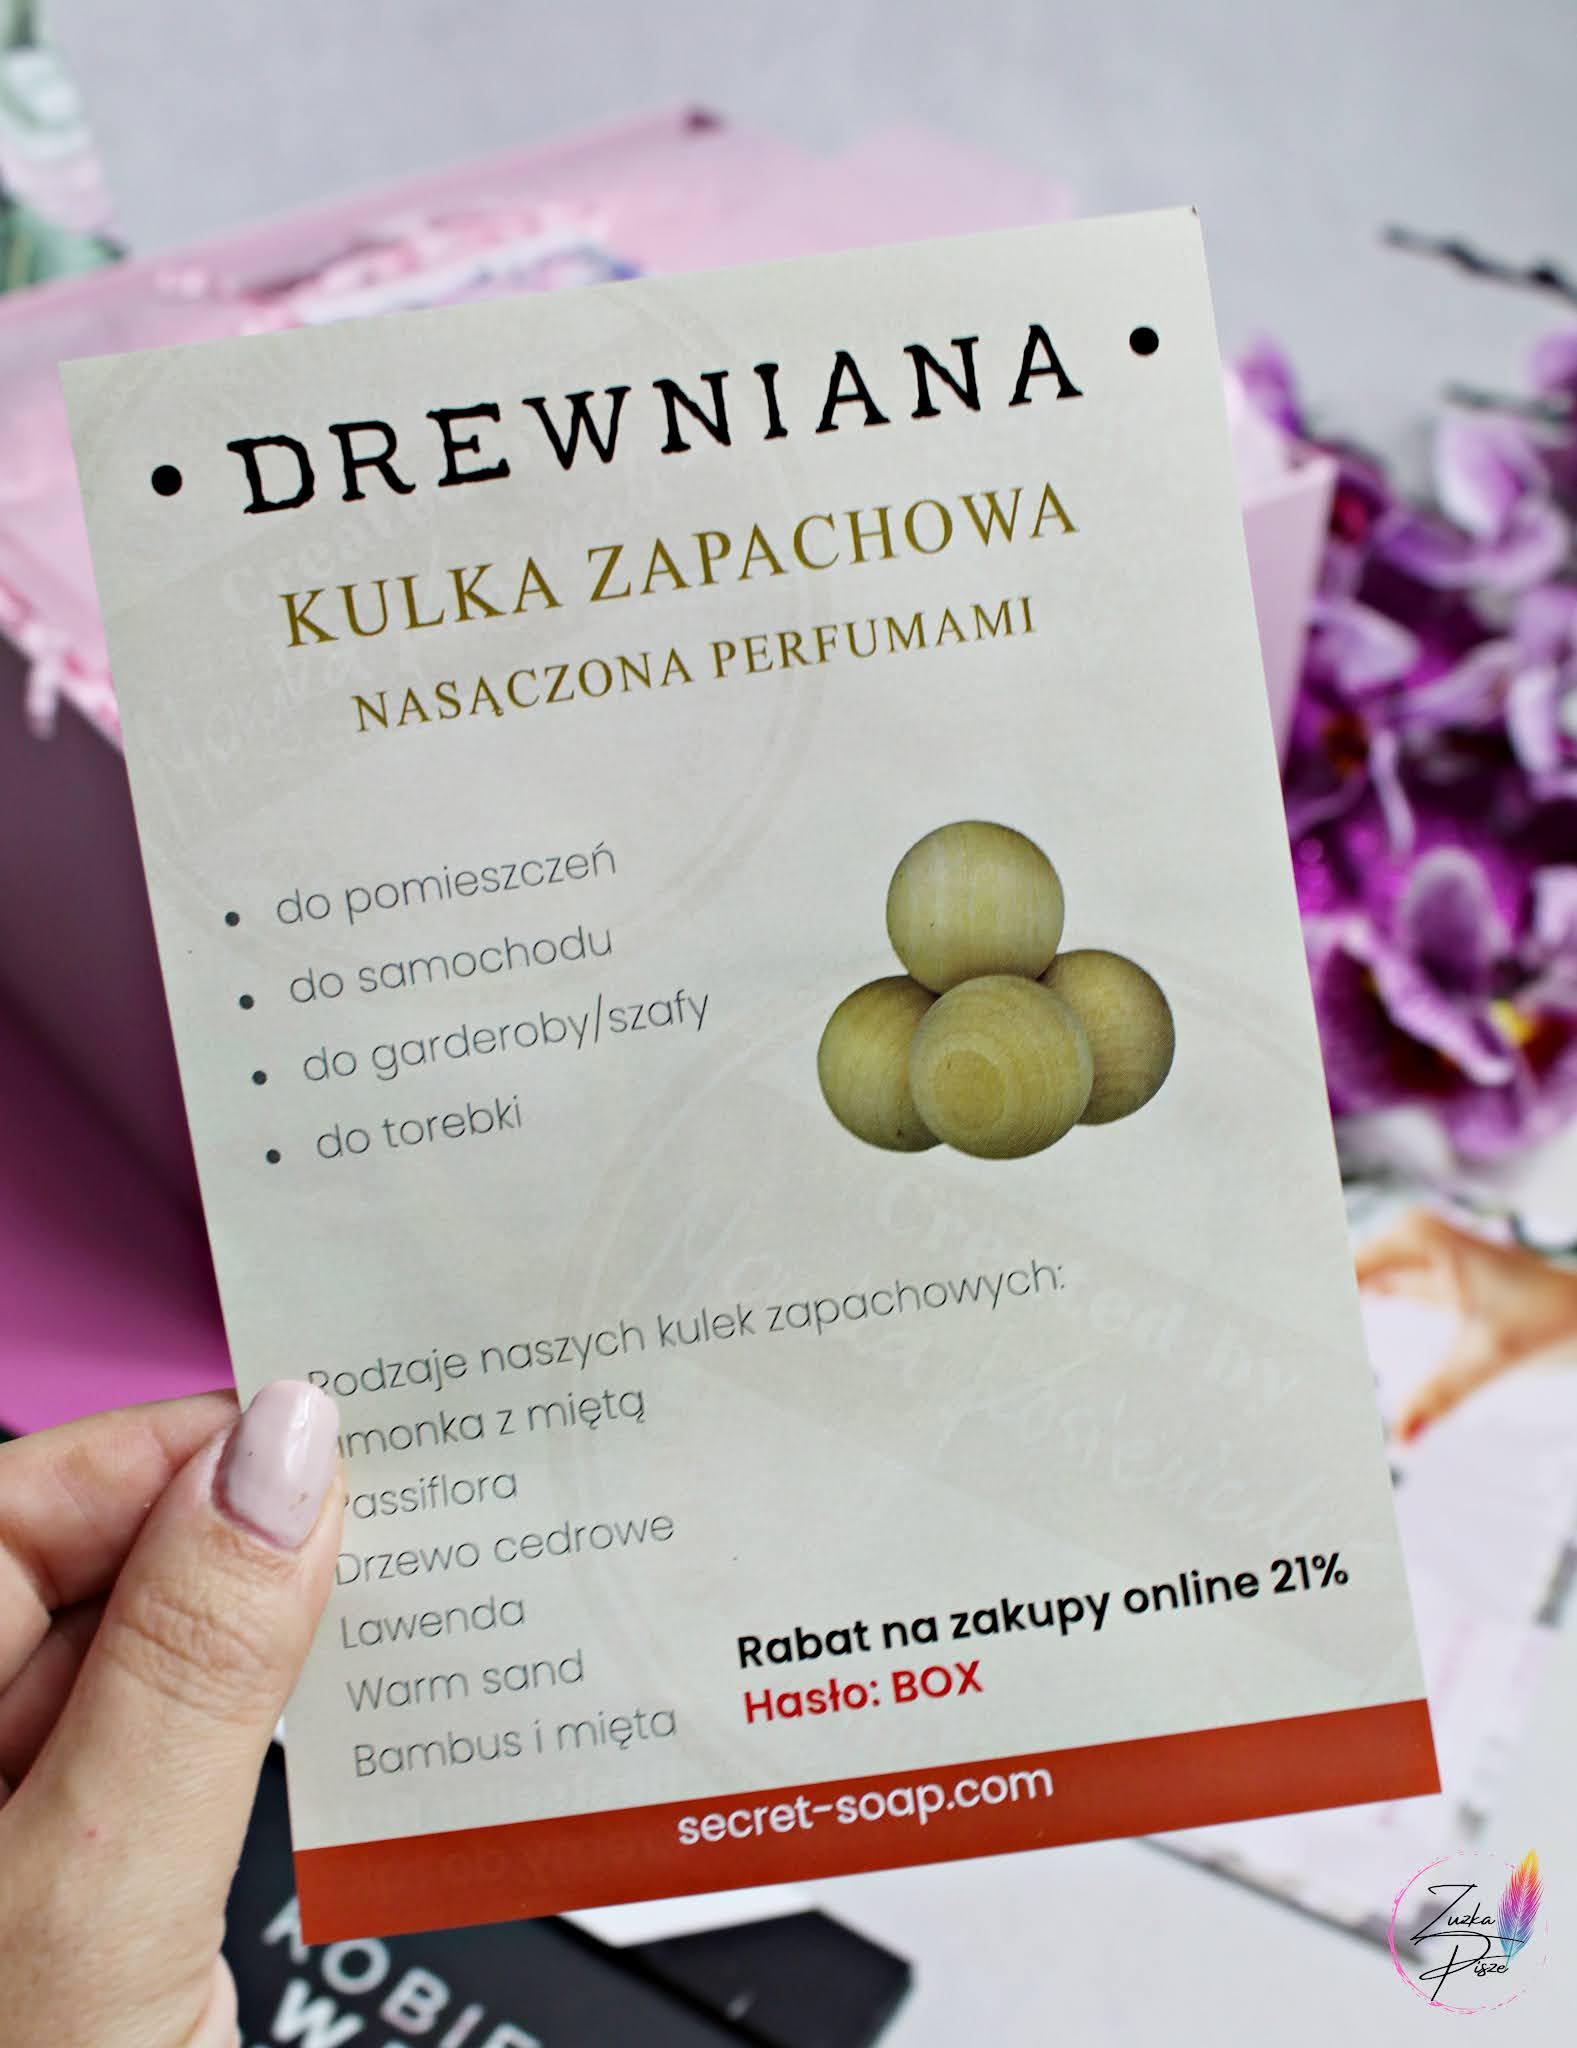 THE SECRET SOAP STORE Drewniana kulka zapachowa